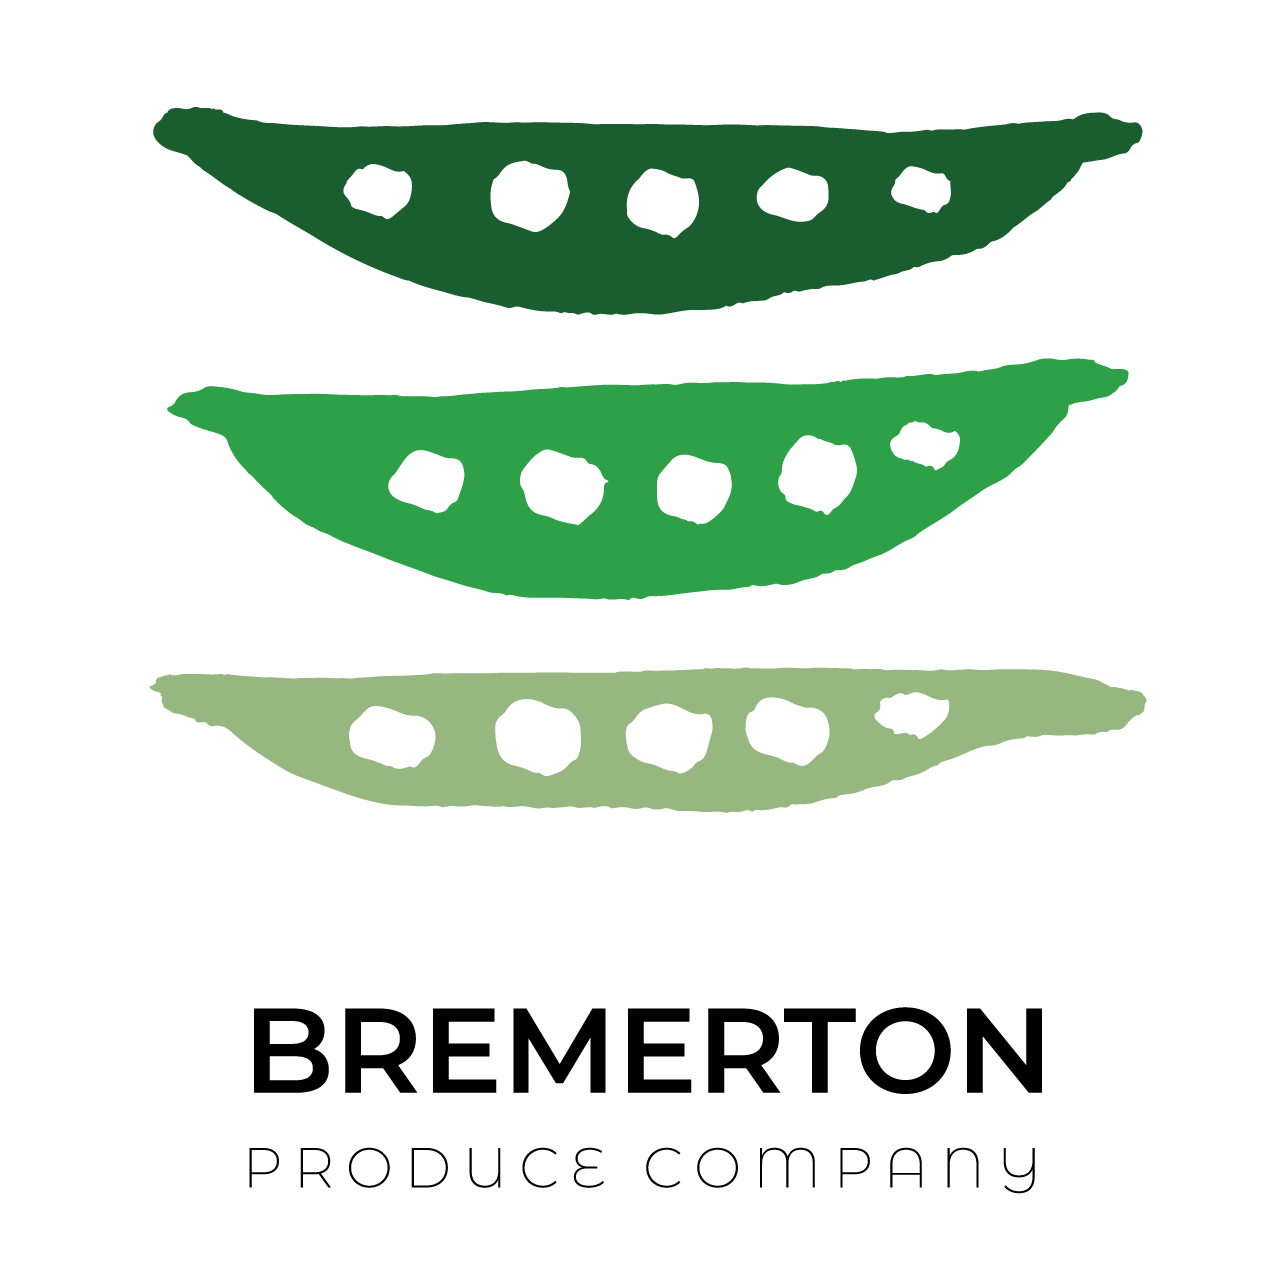 Bremerton Produce Co.